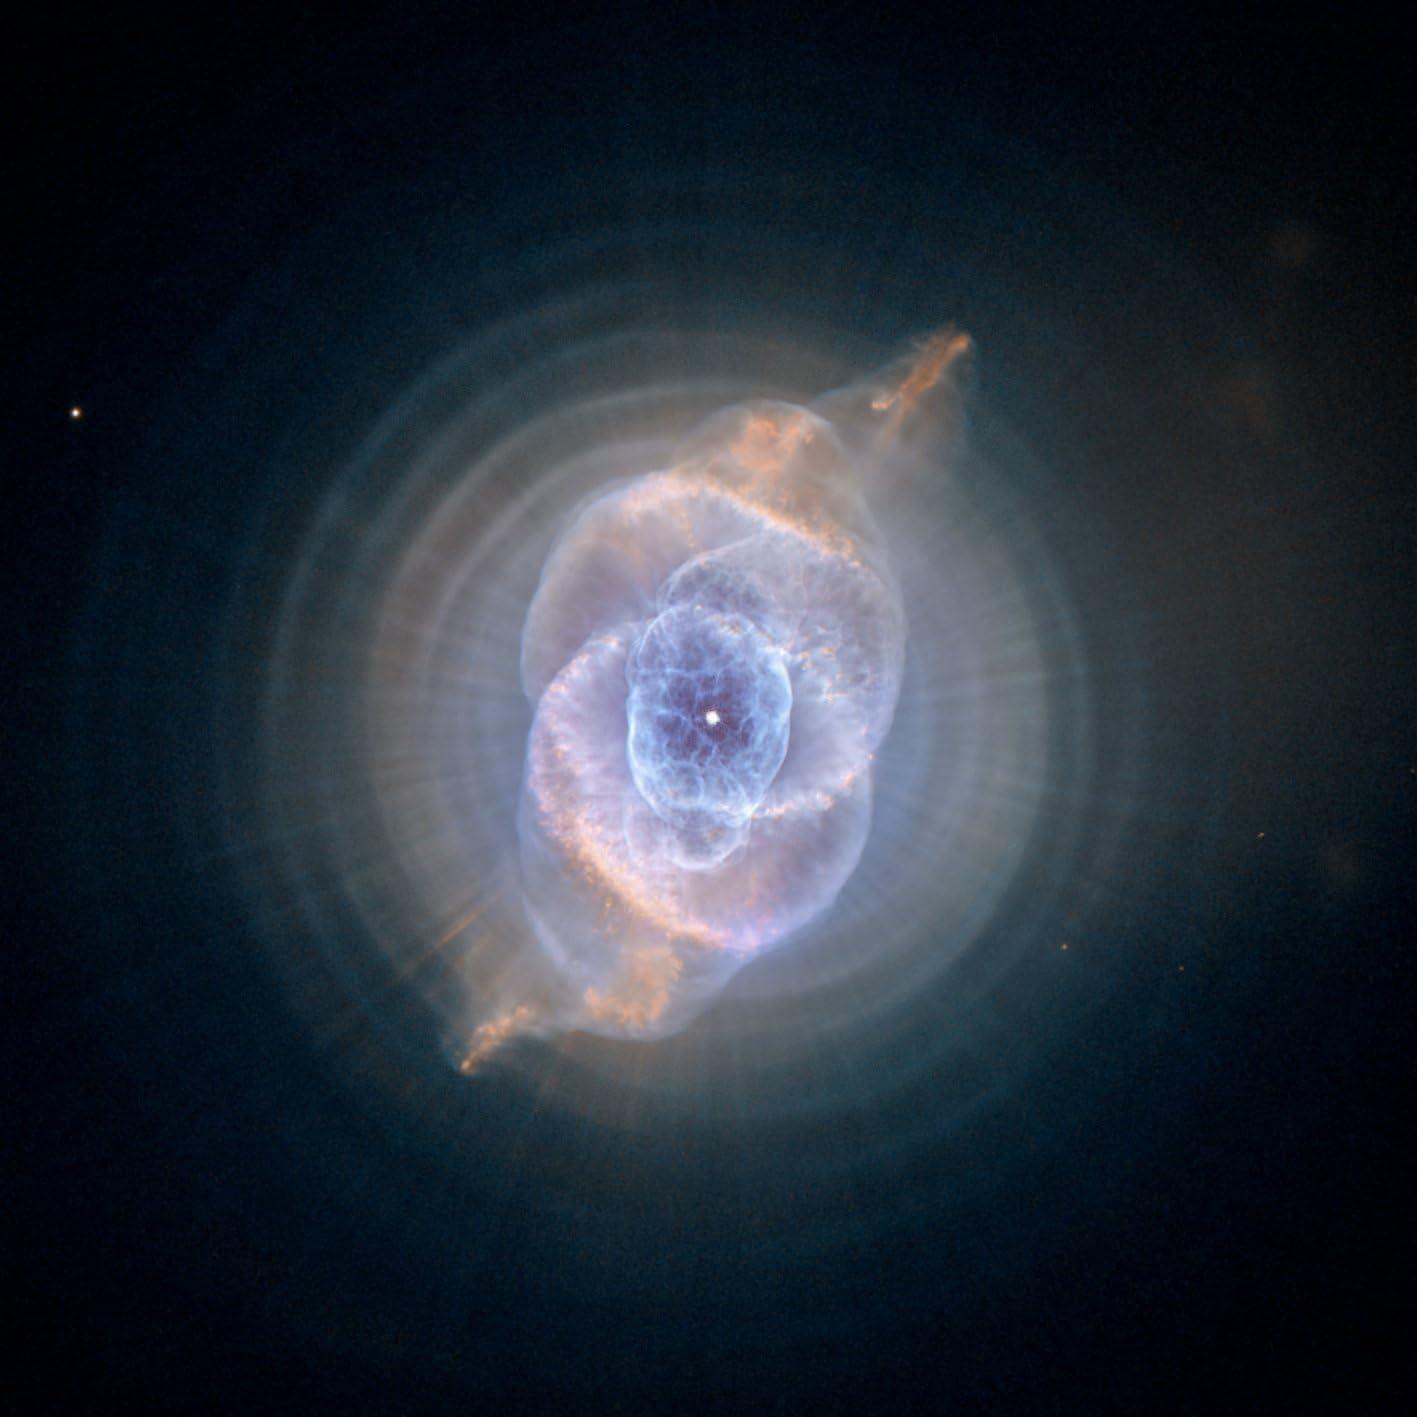 Hubble Space Superior Now free shipping Telescope The Cat's Eye 8x Photos NASA Photo Nebula